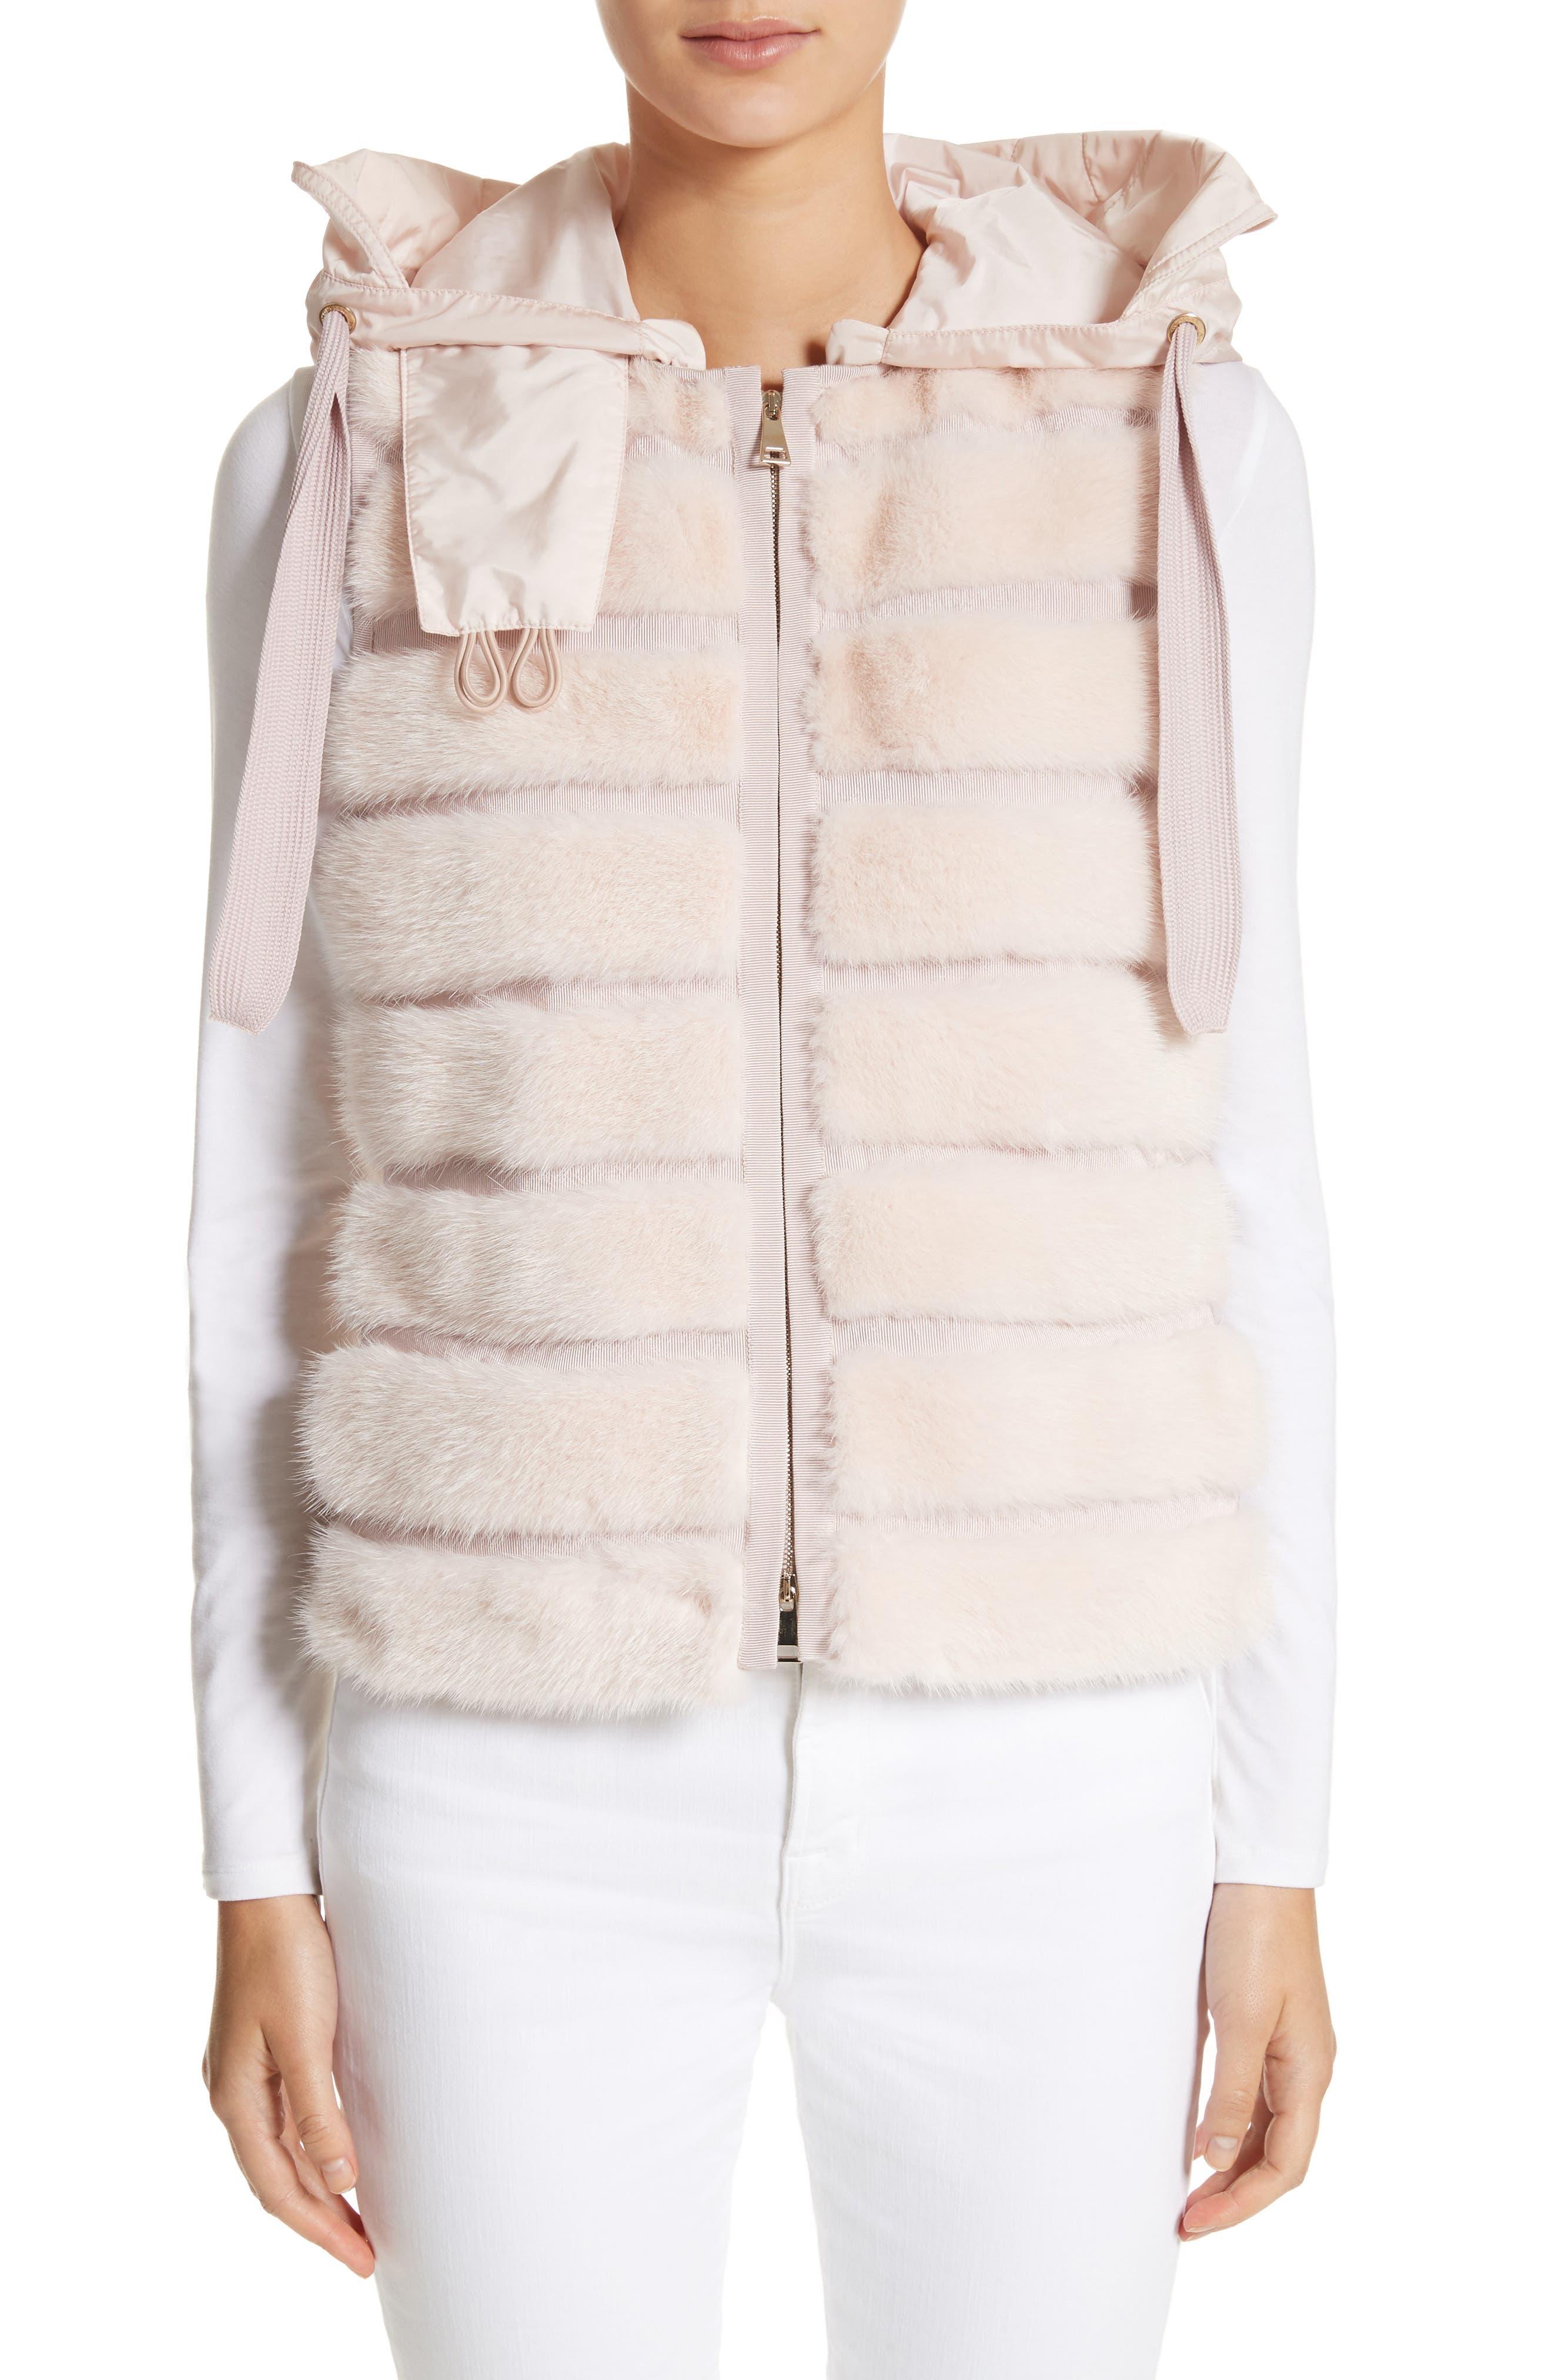 Ametrine Wool & Cashmere Vest with Genuine Mink Fur Trim & Removable Hood,                         Main,                         color, Blush